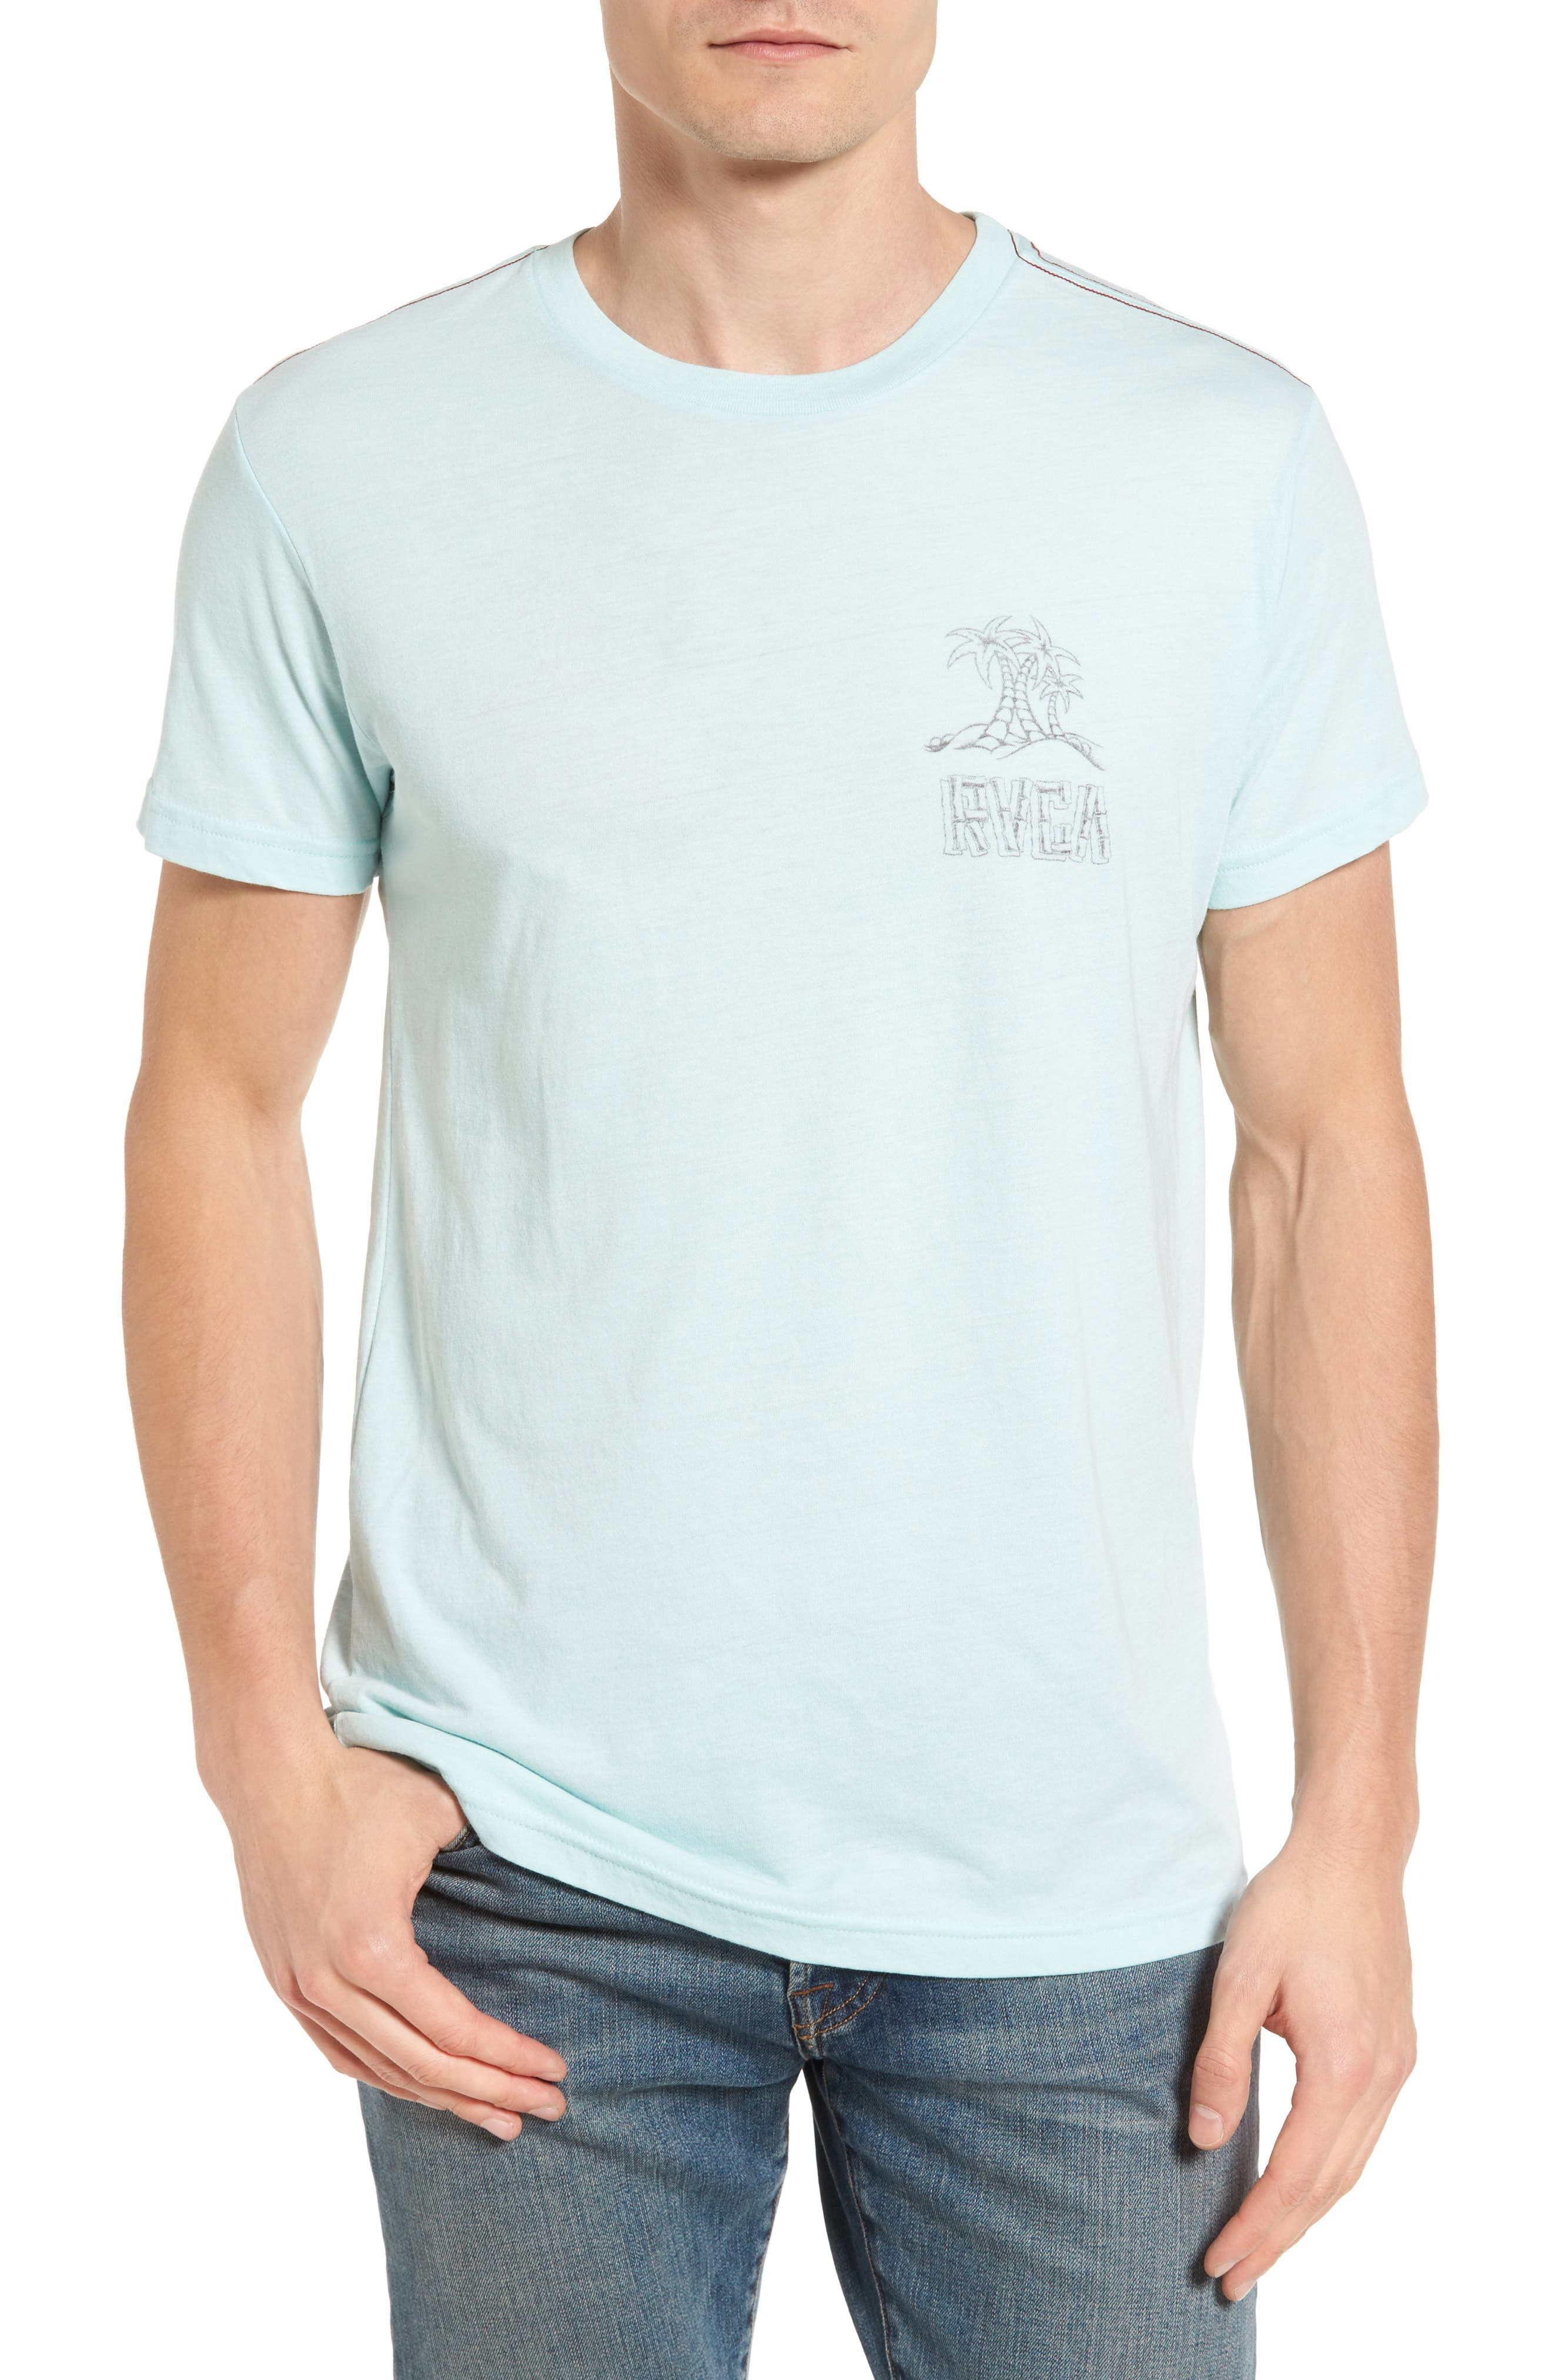 RVCA Hula Girl Graphic T-Shirt